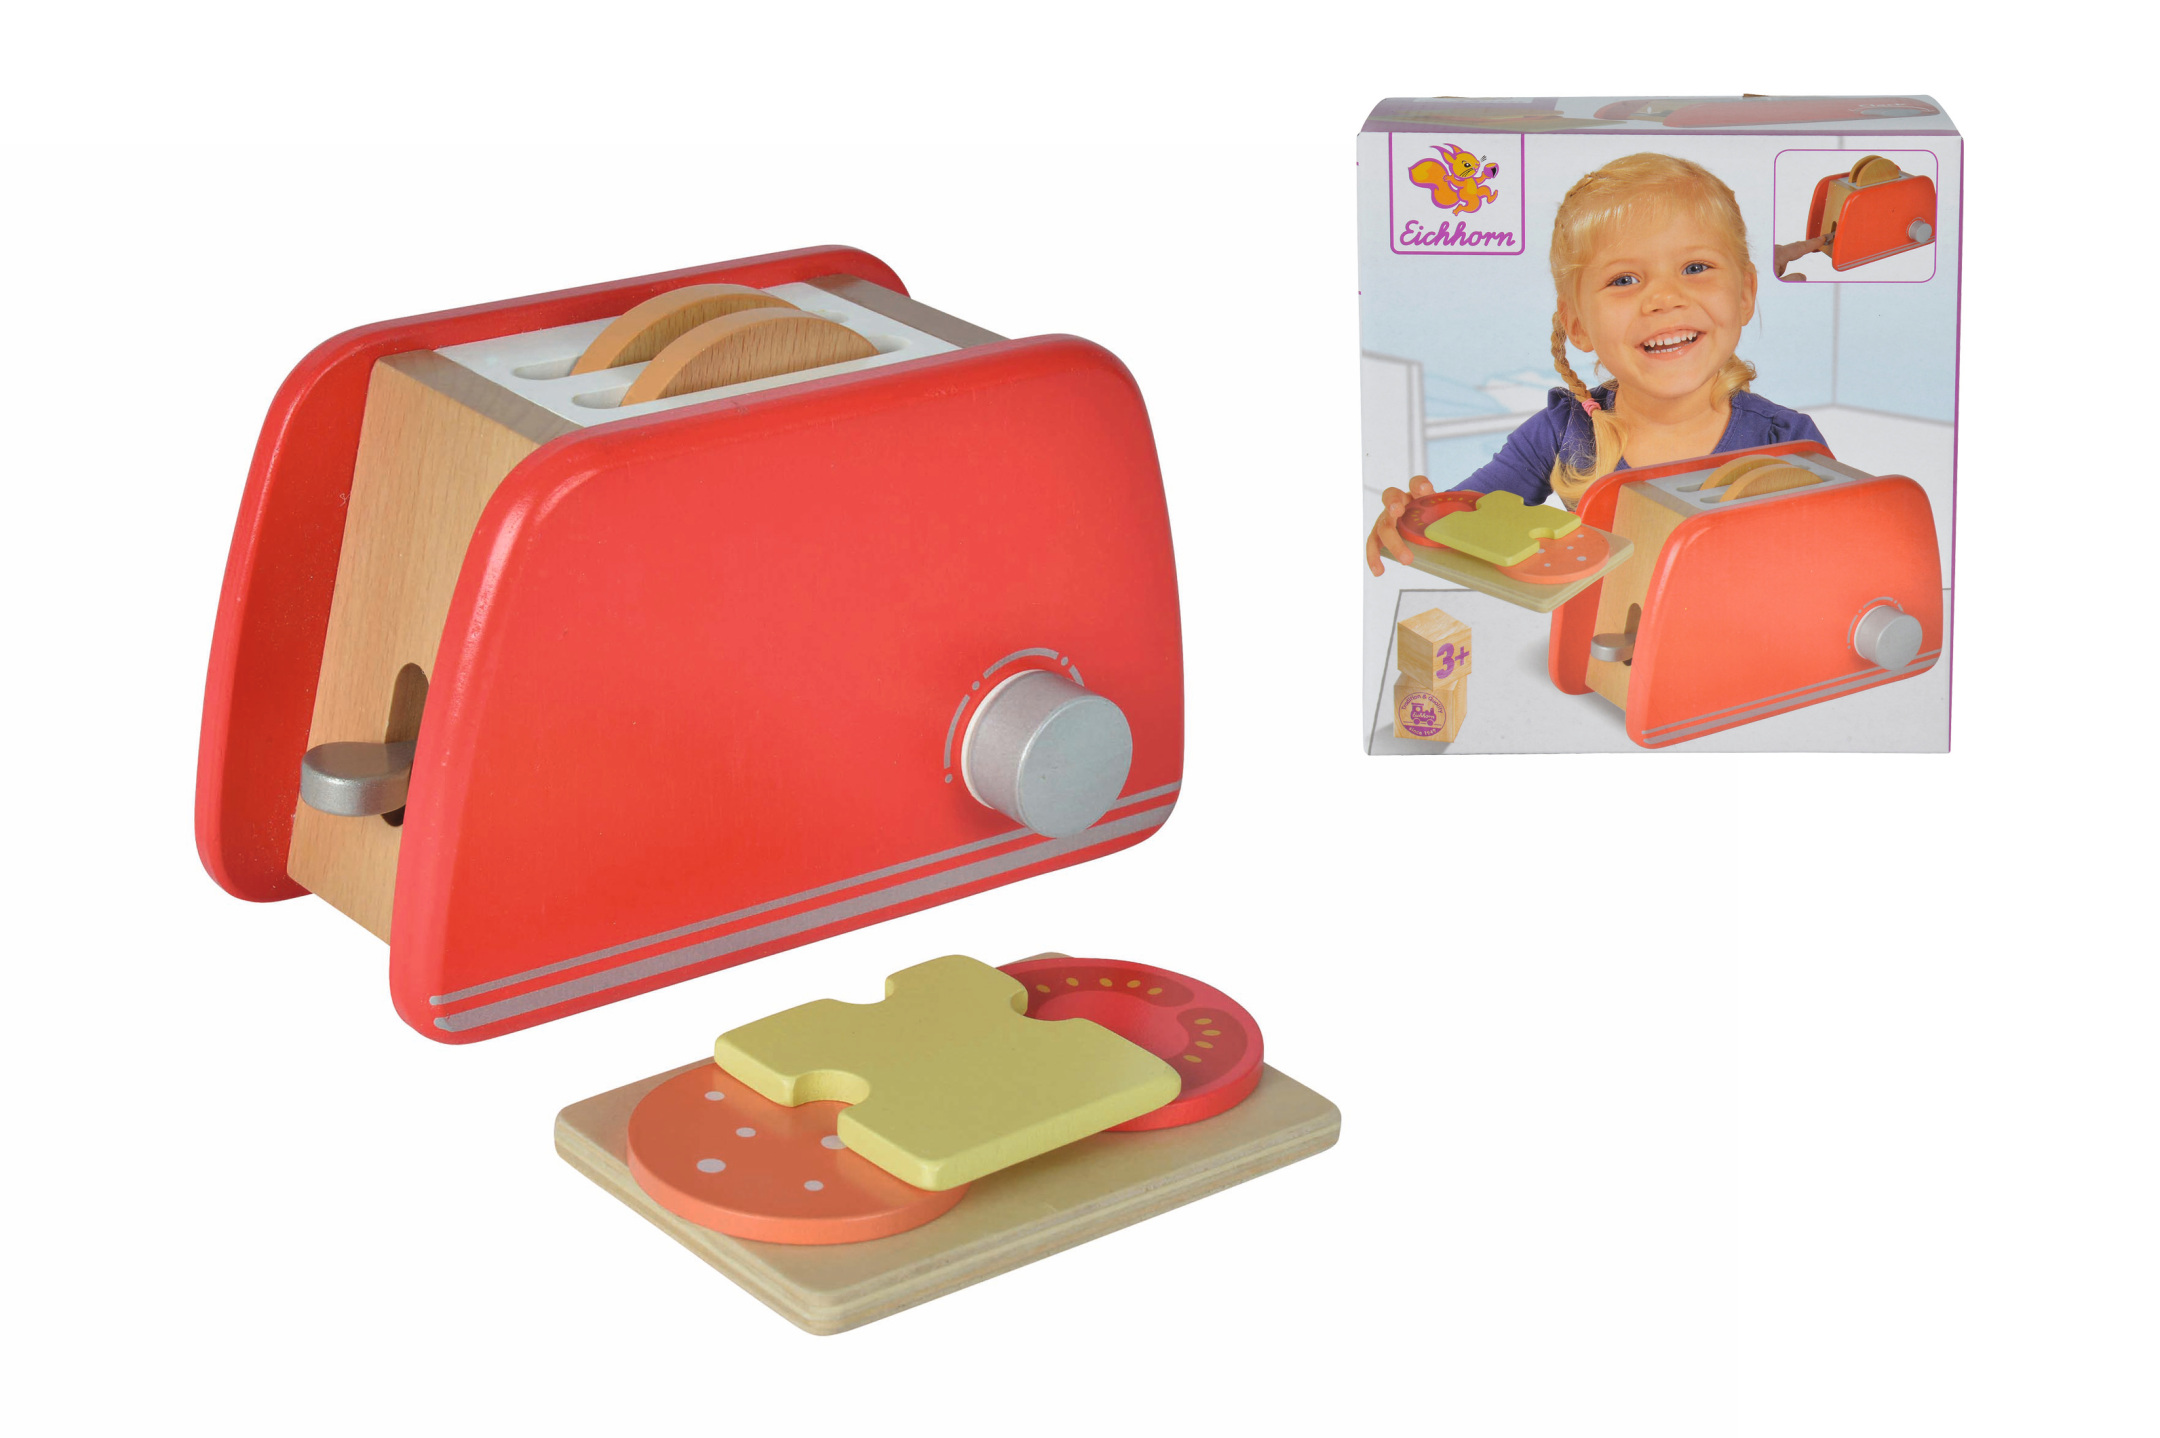 Eichhorn - Toaster Spielset 7tlg.